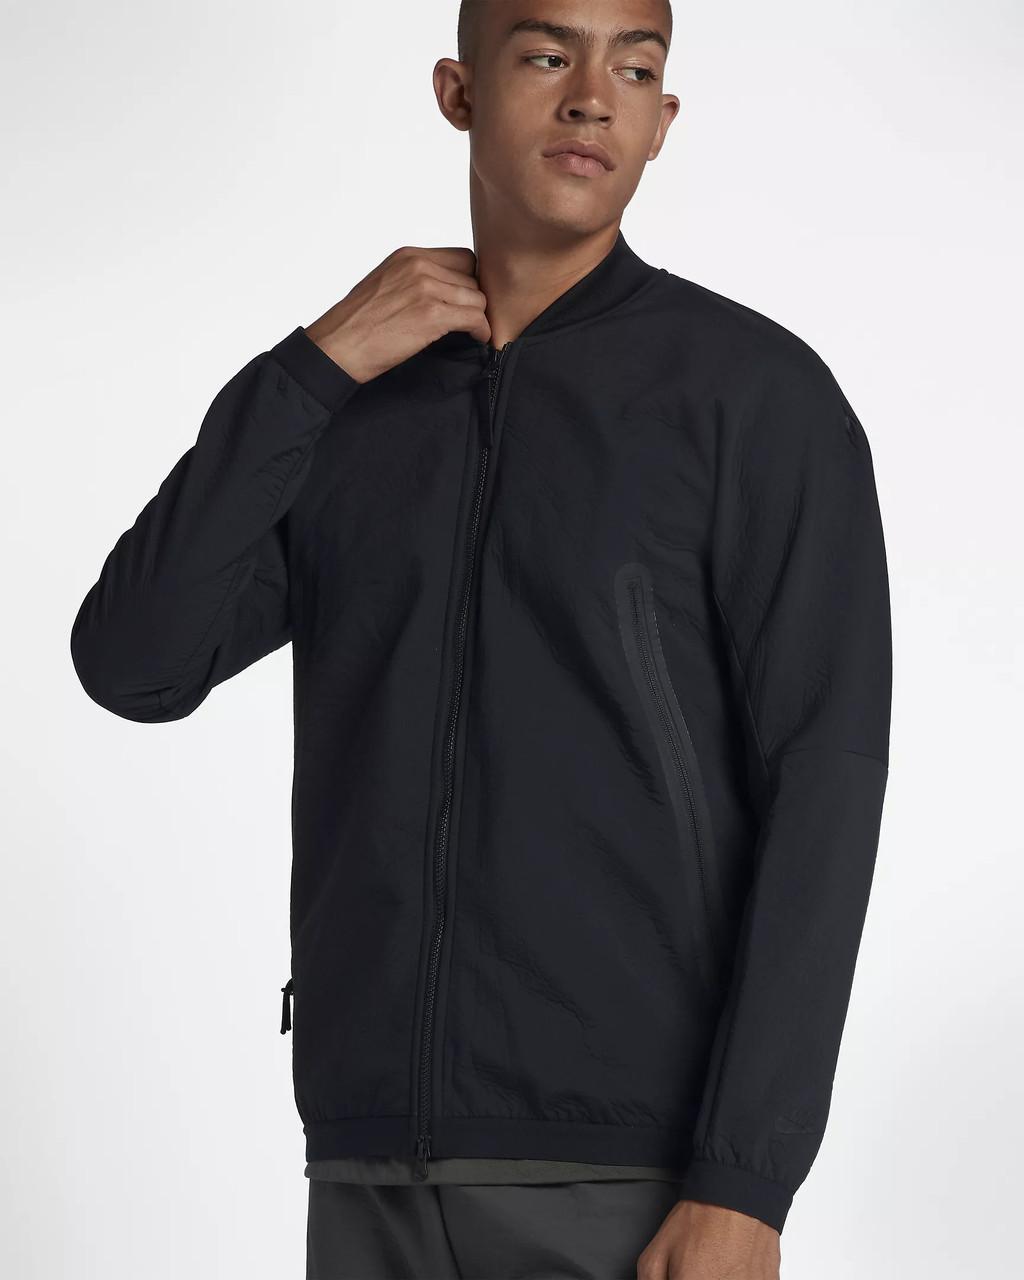 2a455ae3 Куртка Nike Sportswear Tech Pack Woven Track Jacket 928561-010 (Оригинал) -  Football